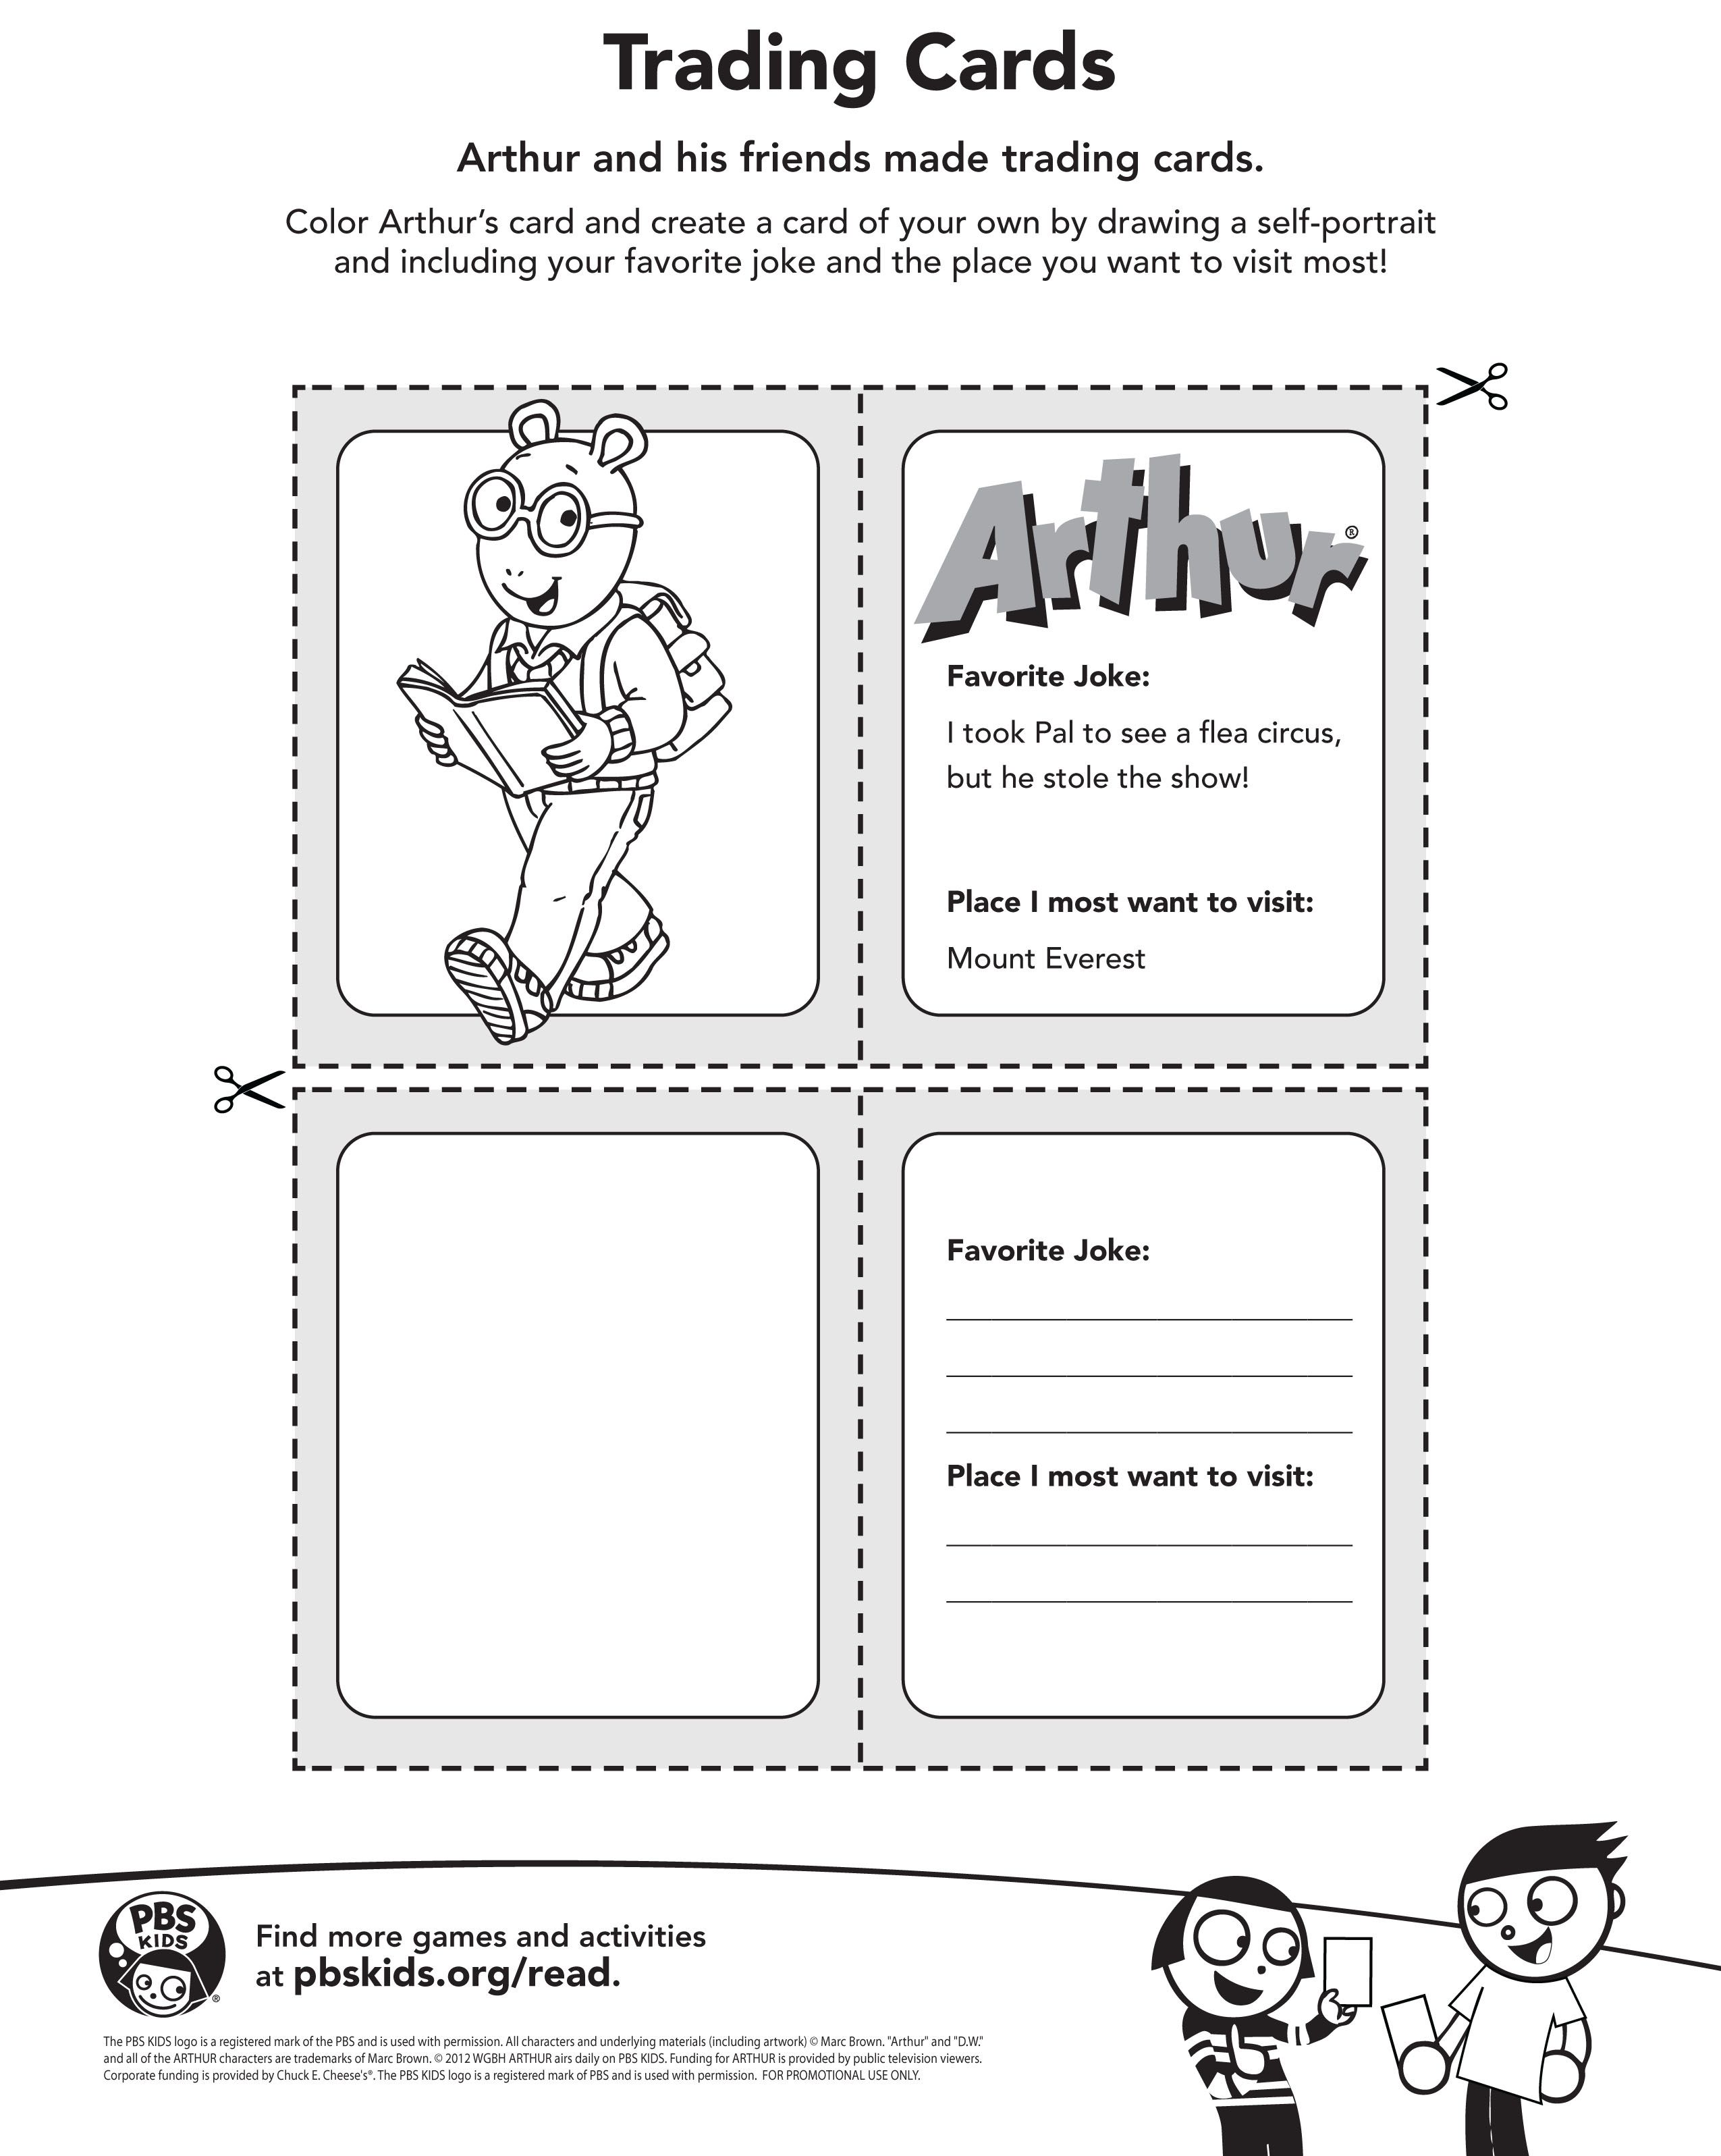 Creating Your Own Trading Card Just Like Arthur Arthur